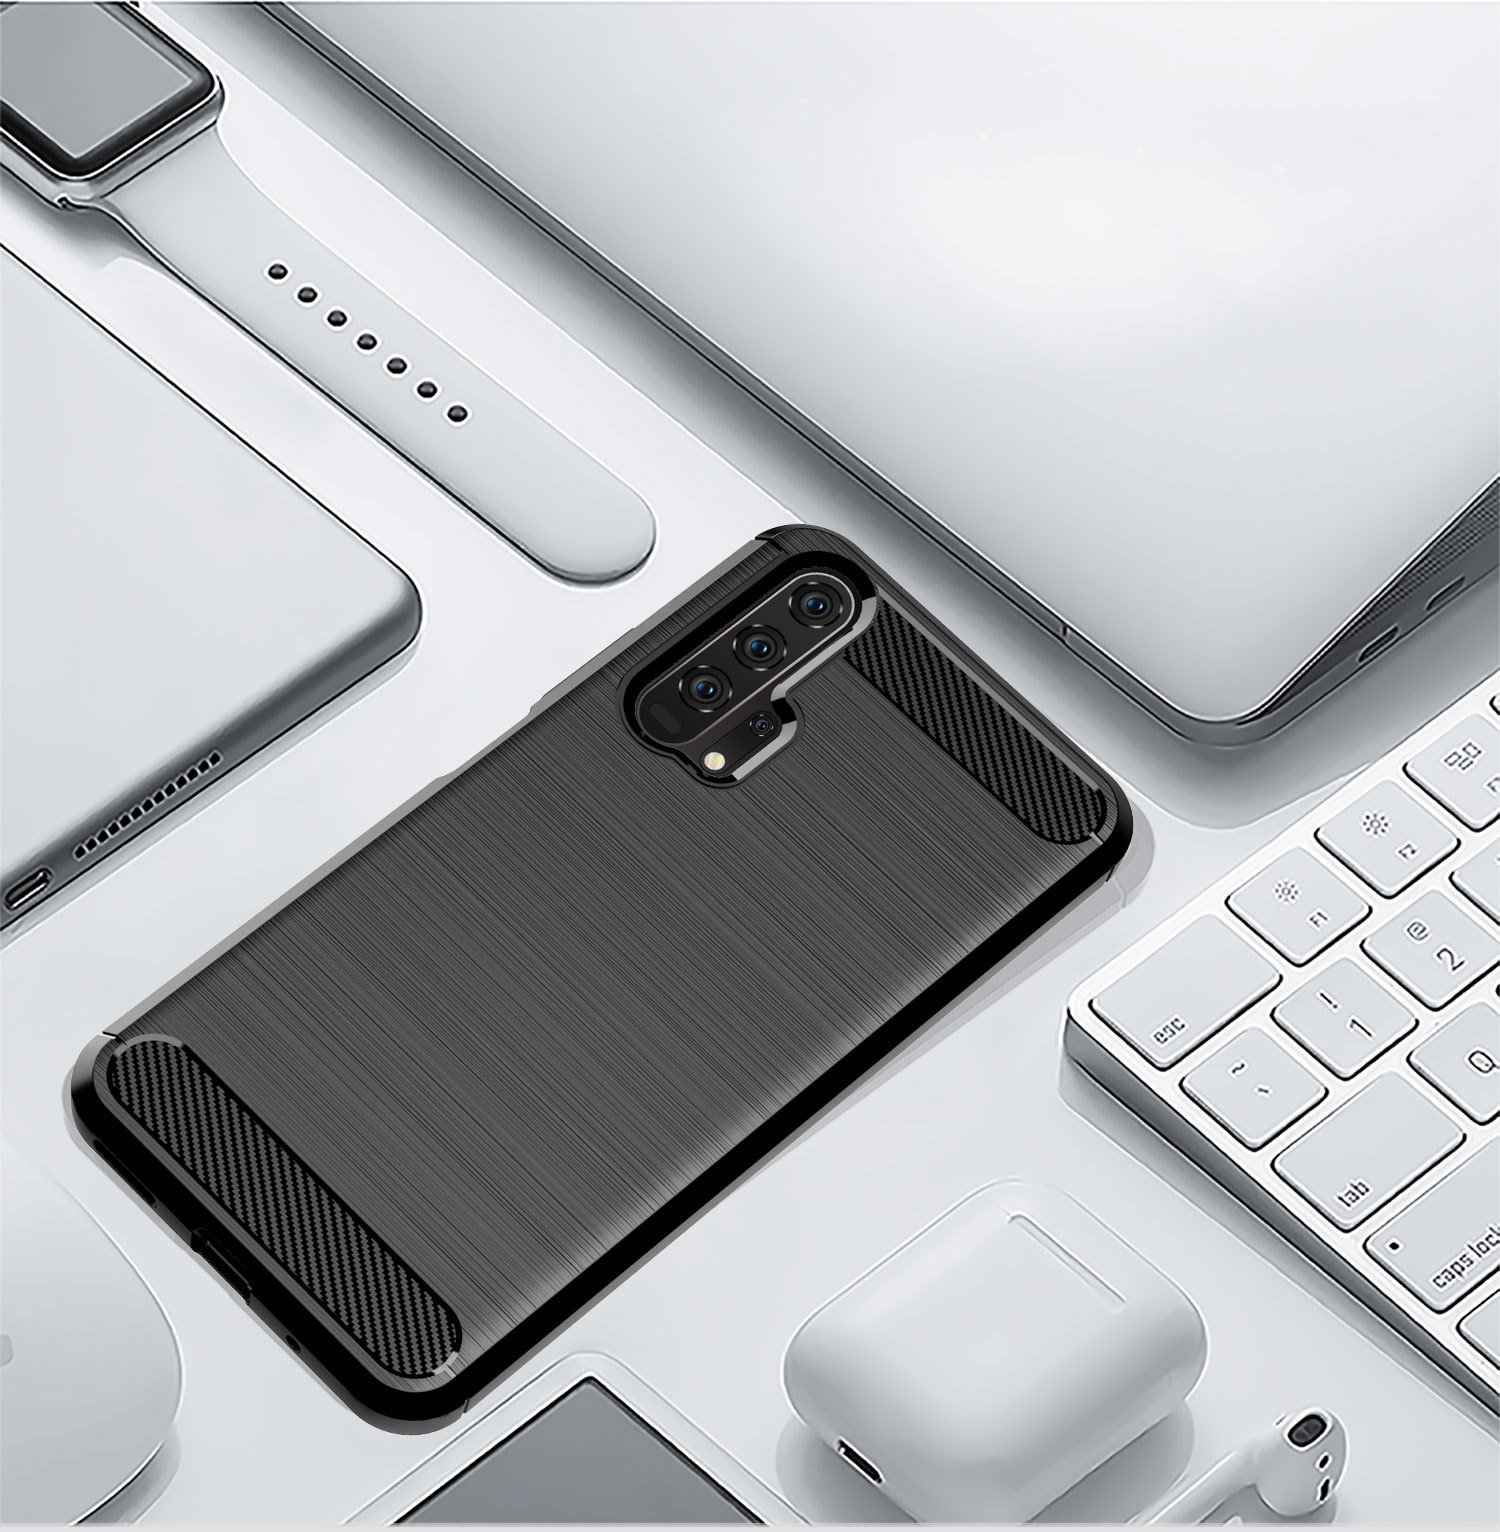 Чехол Honor 20 (Honor 20S, 20 Pro, Huawei Nova 5T) цвет Black (черный), серия Carbon, Caseport